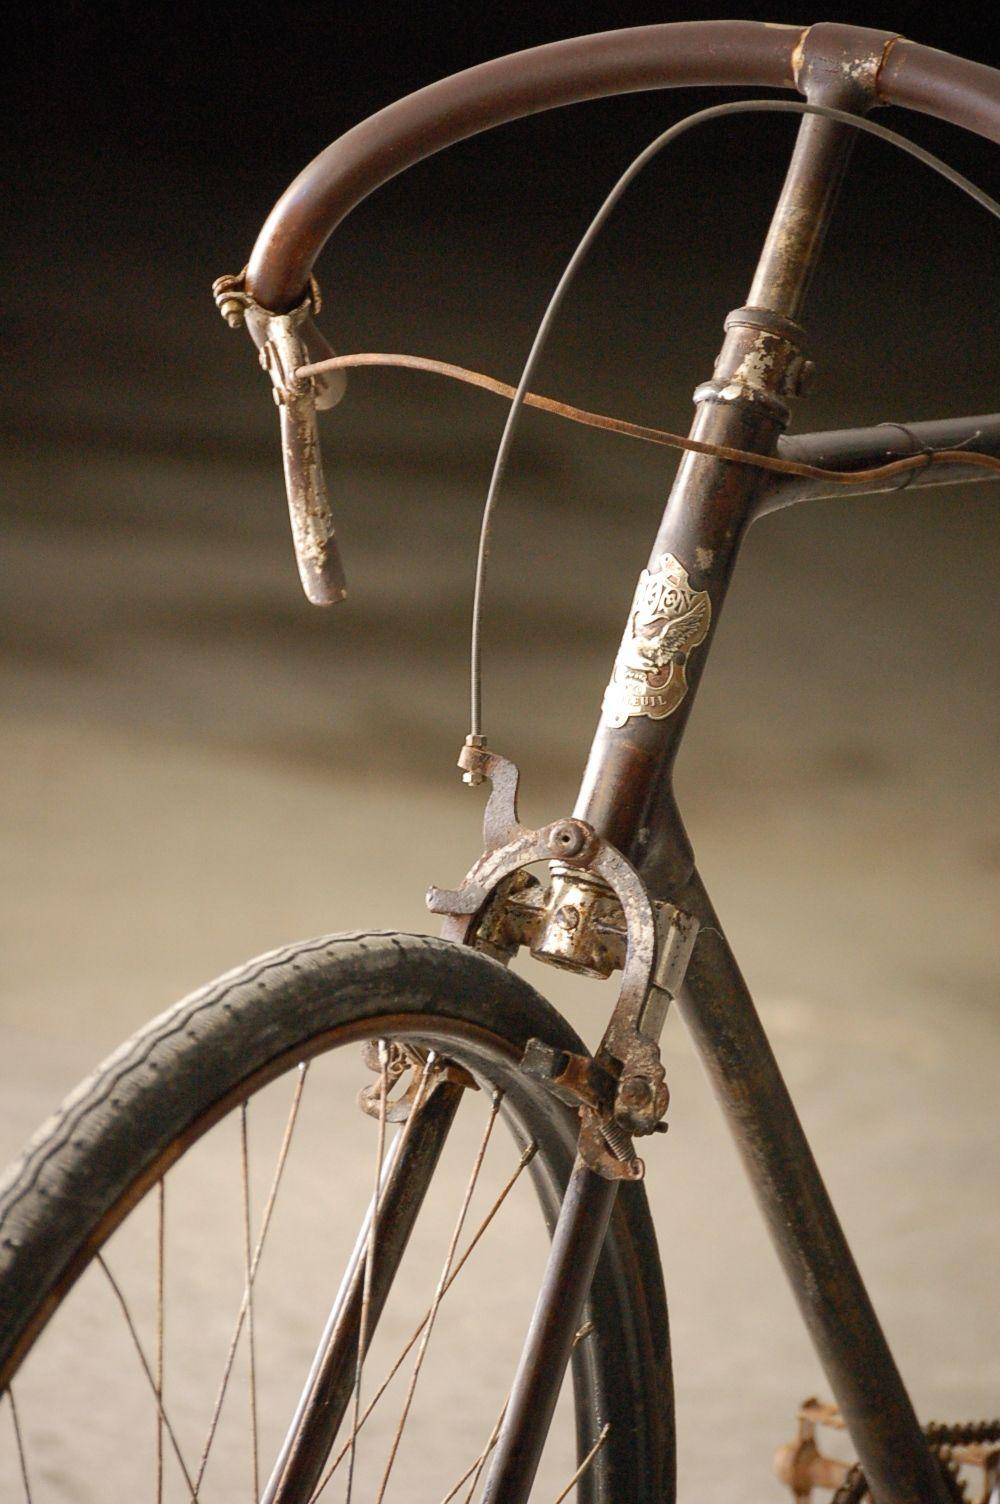 from bolgherese elegantly vintage bicycles for sale bolgherese gentlemen 39 s bicycles. Black Bedroom Furniture Sets. Home Design Ideas